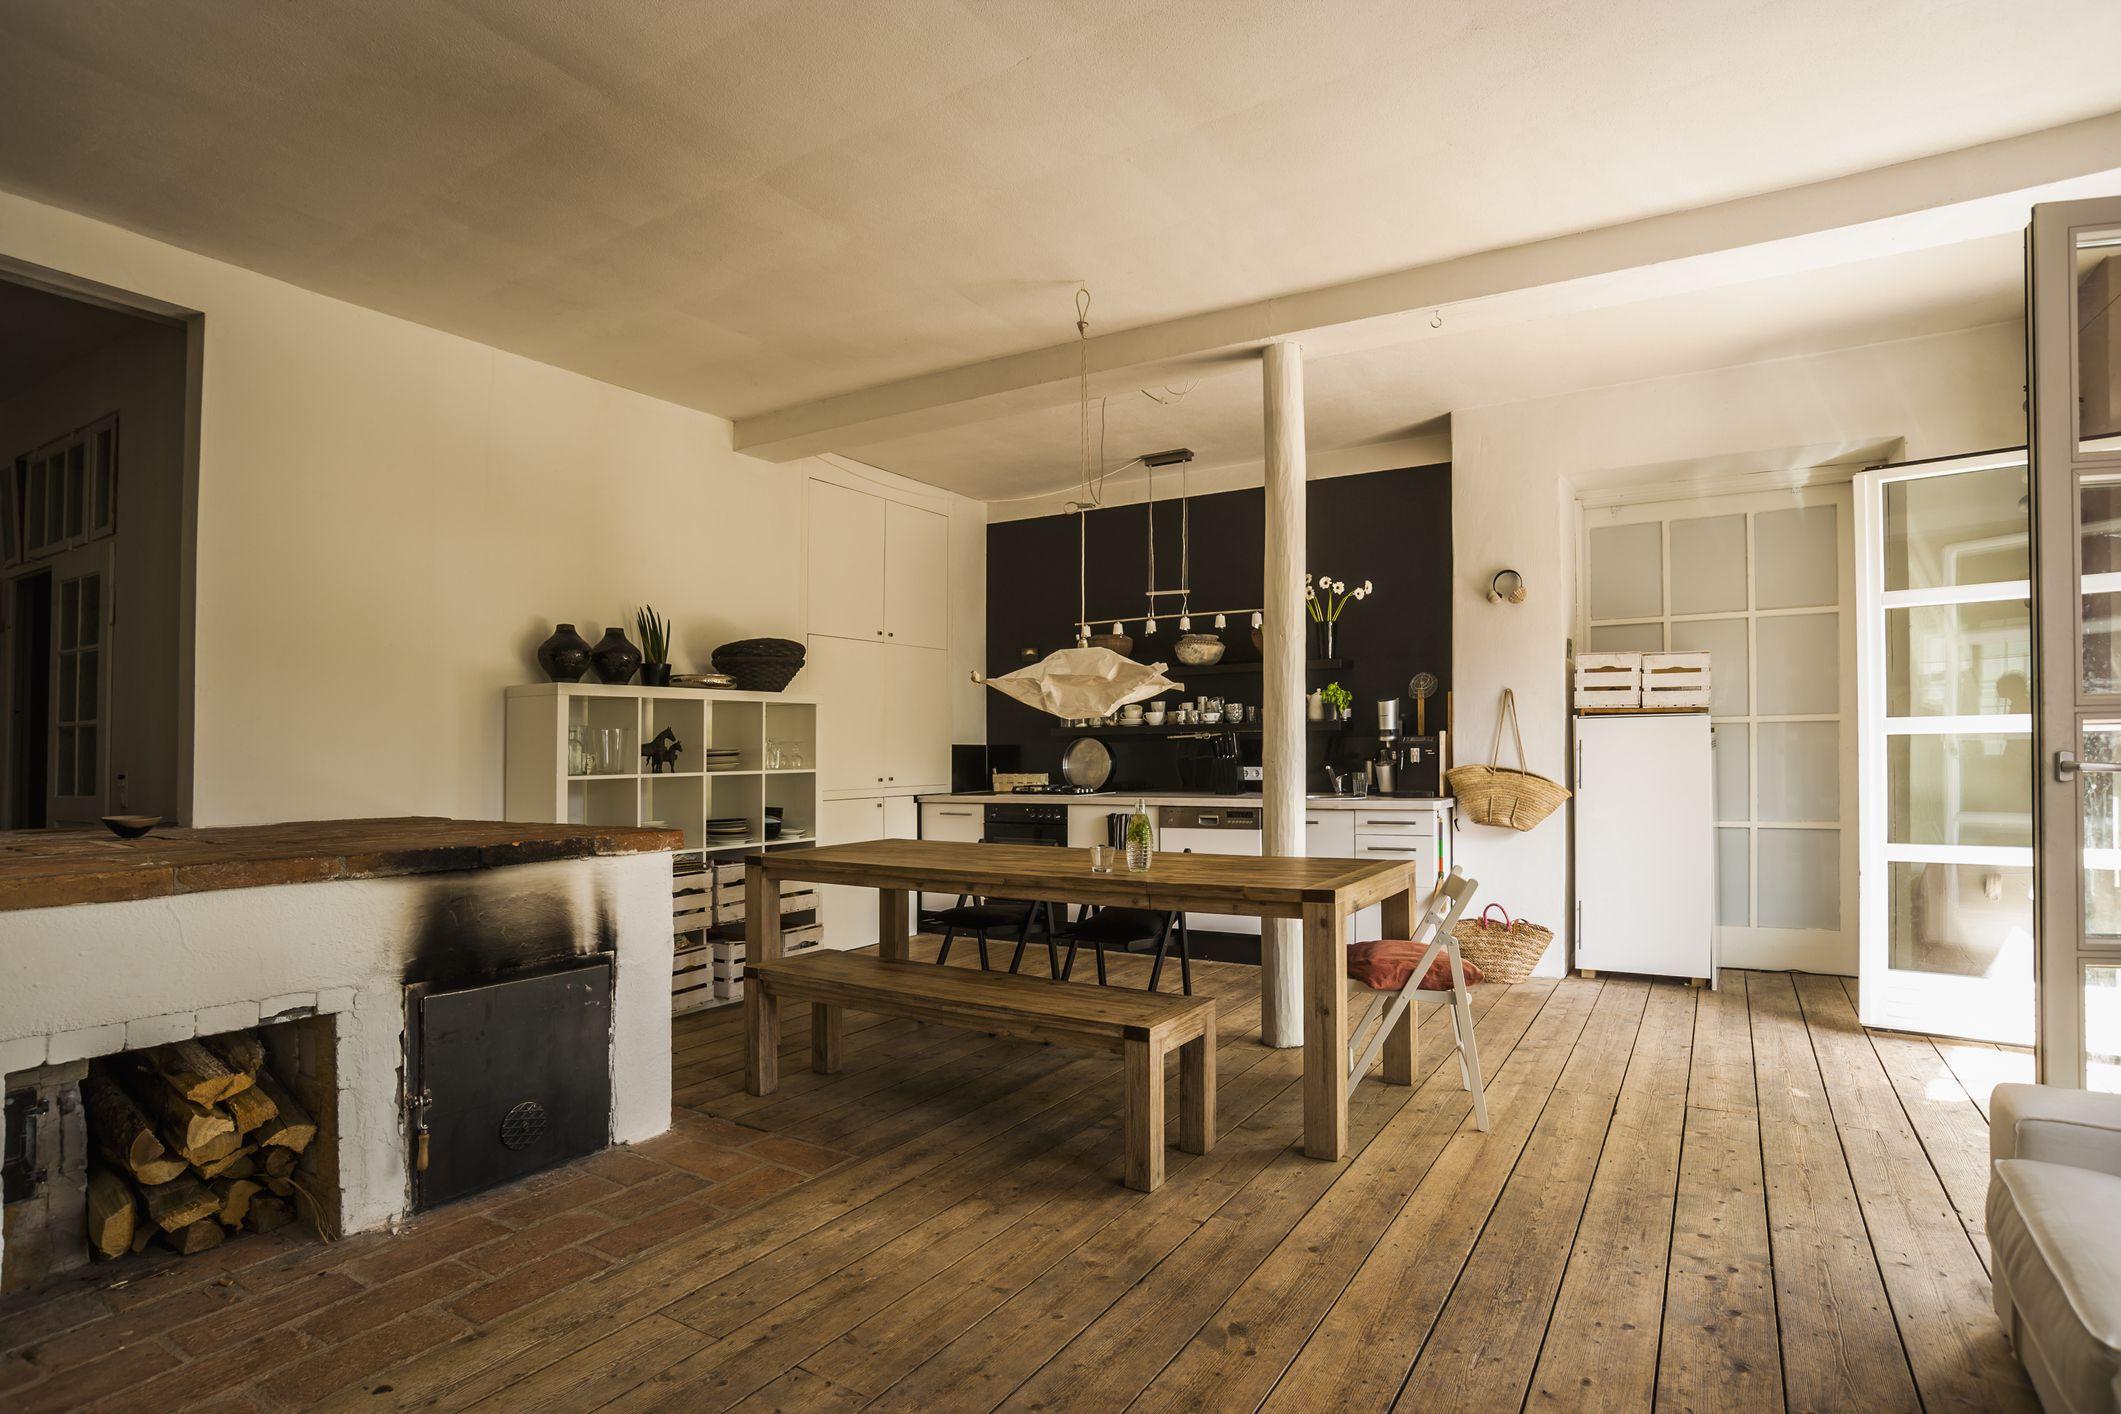 hardwood flooring clearance ontario of vinyl wood flooring versus natural hardwood with diningroom woodenfloor gettyimages 544546775 590e57565f9b58647043440a